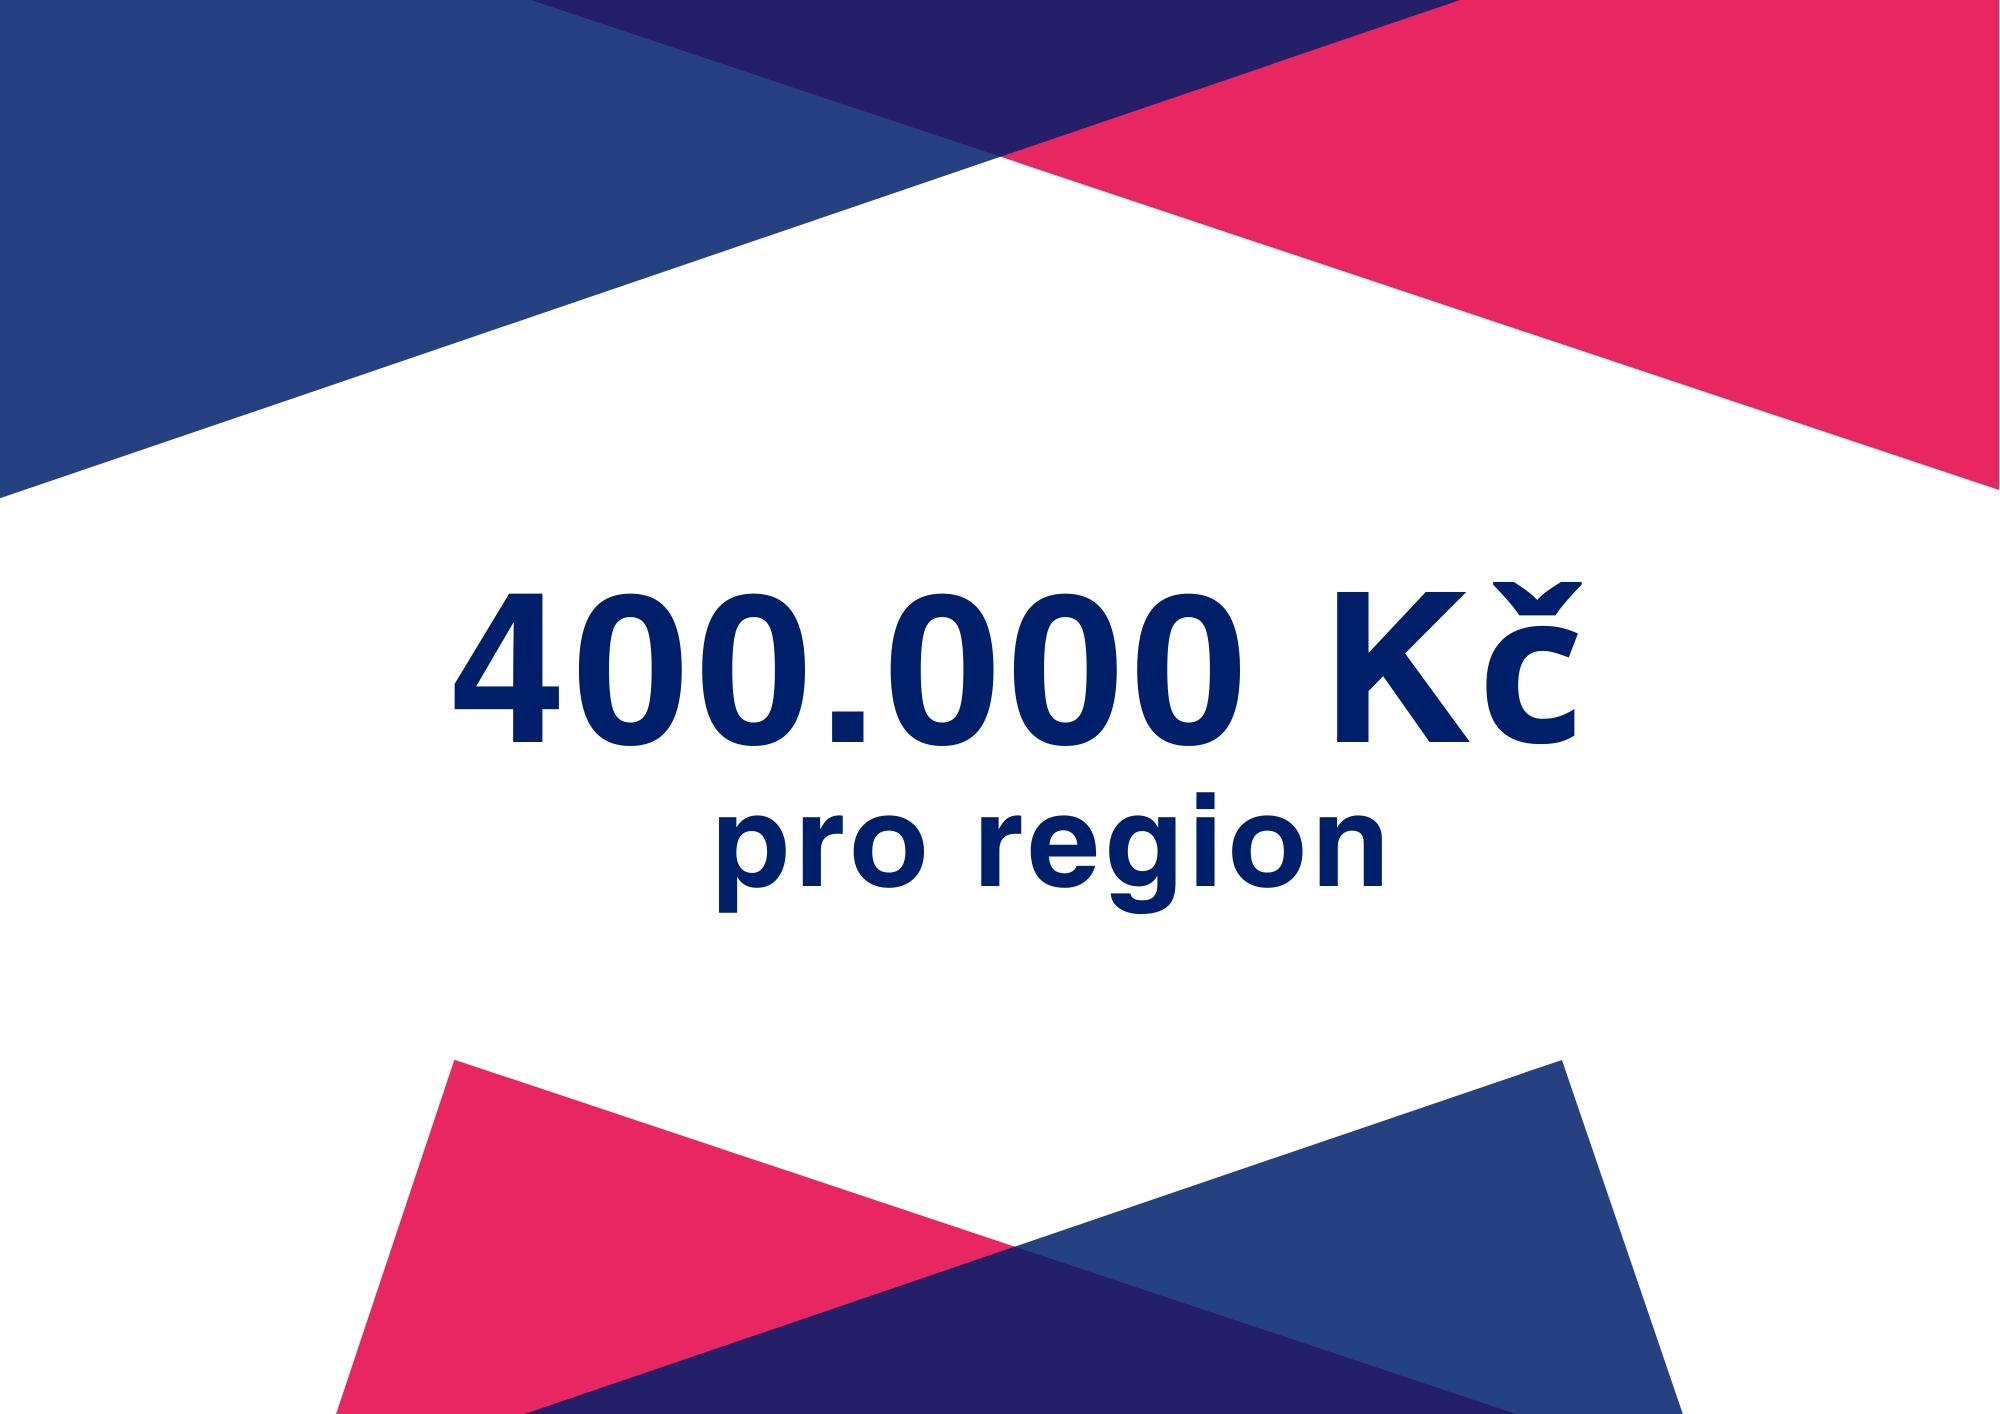 Fond AGC Automotive Czech letos podpoří region 400.000 korun